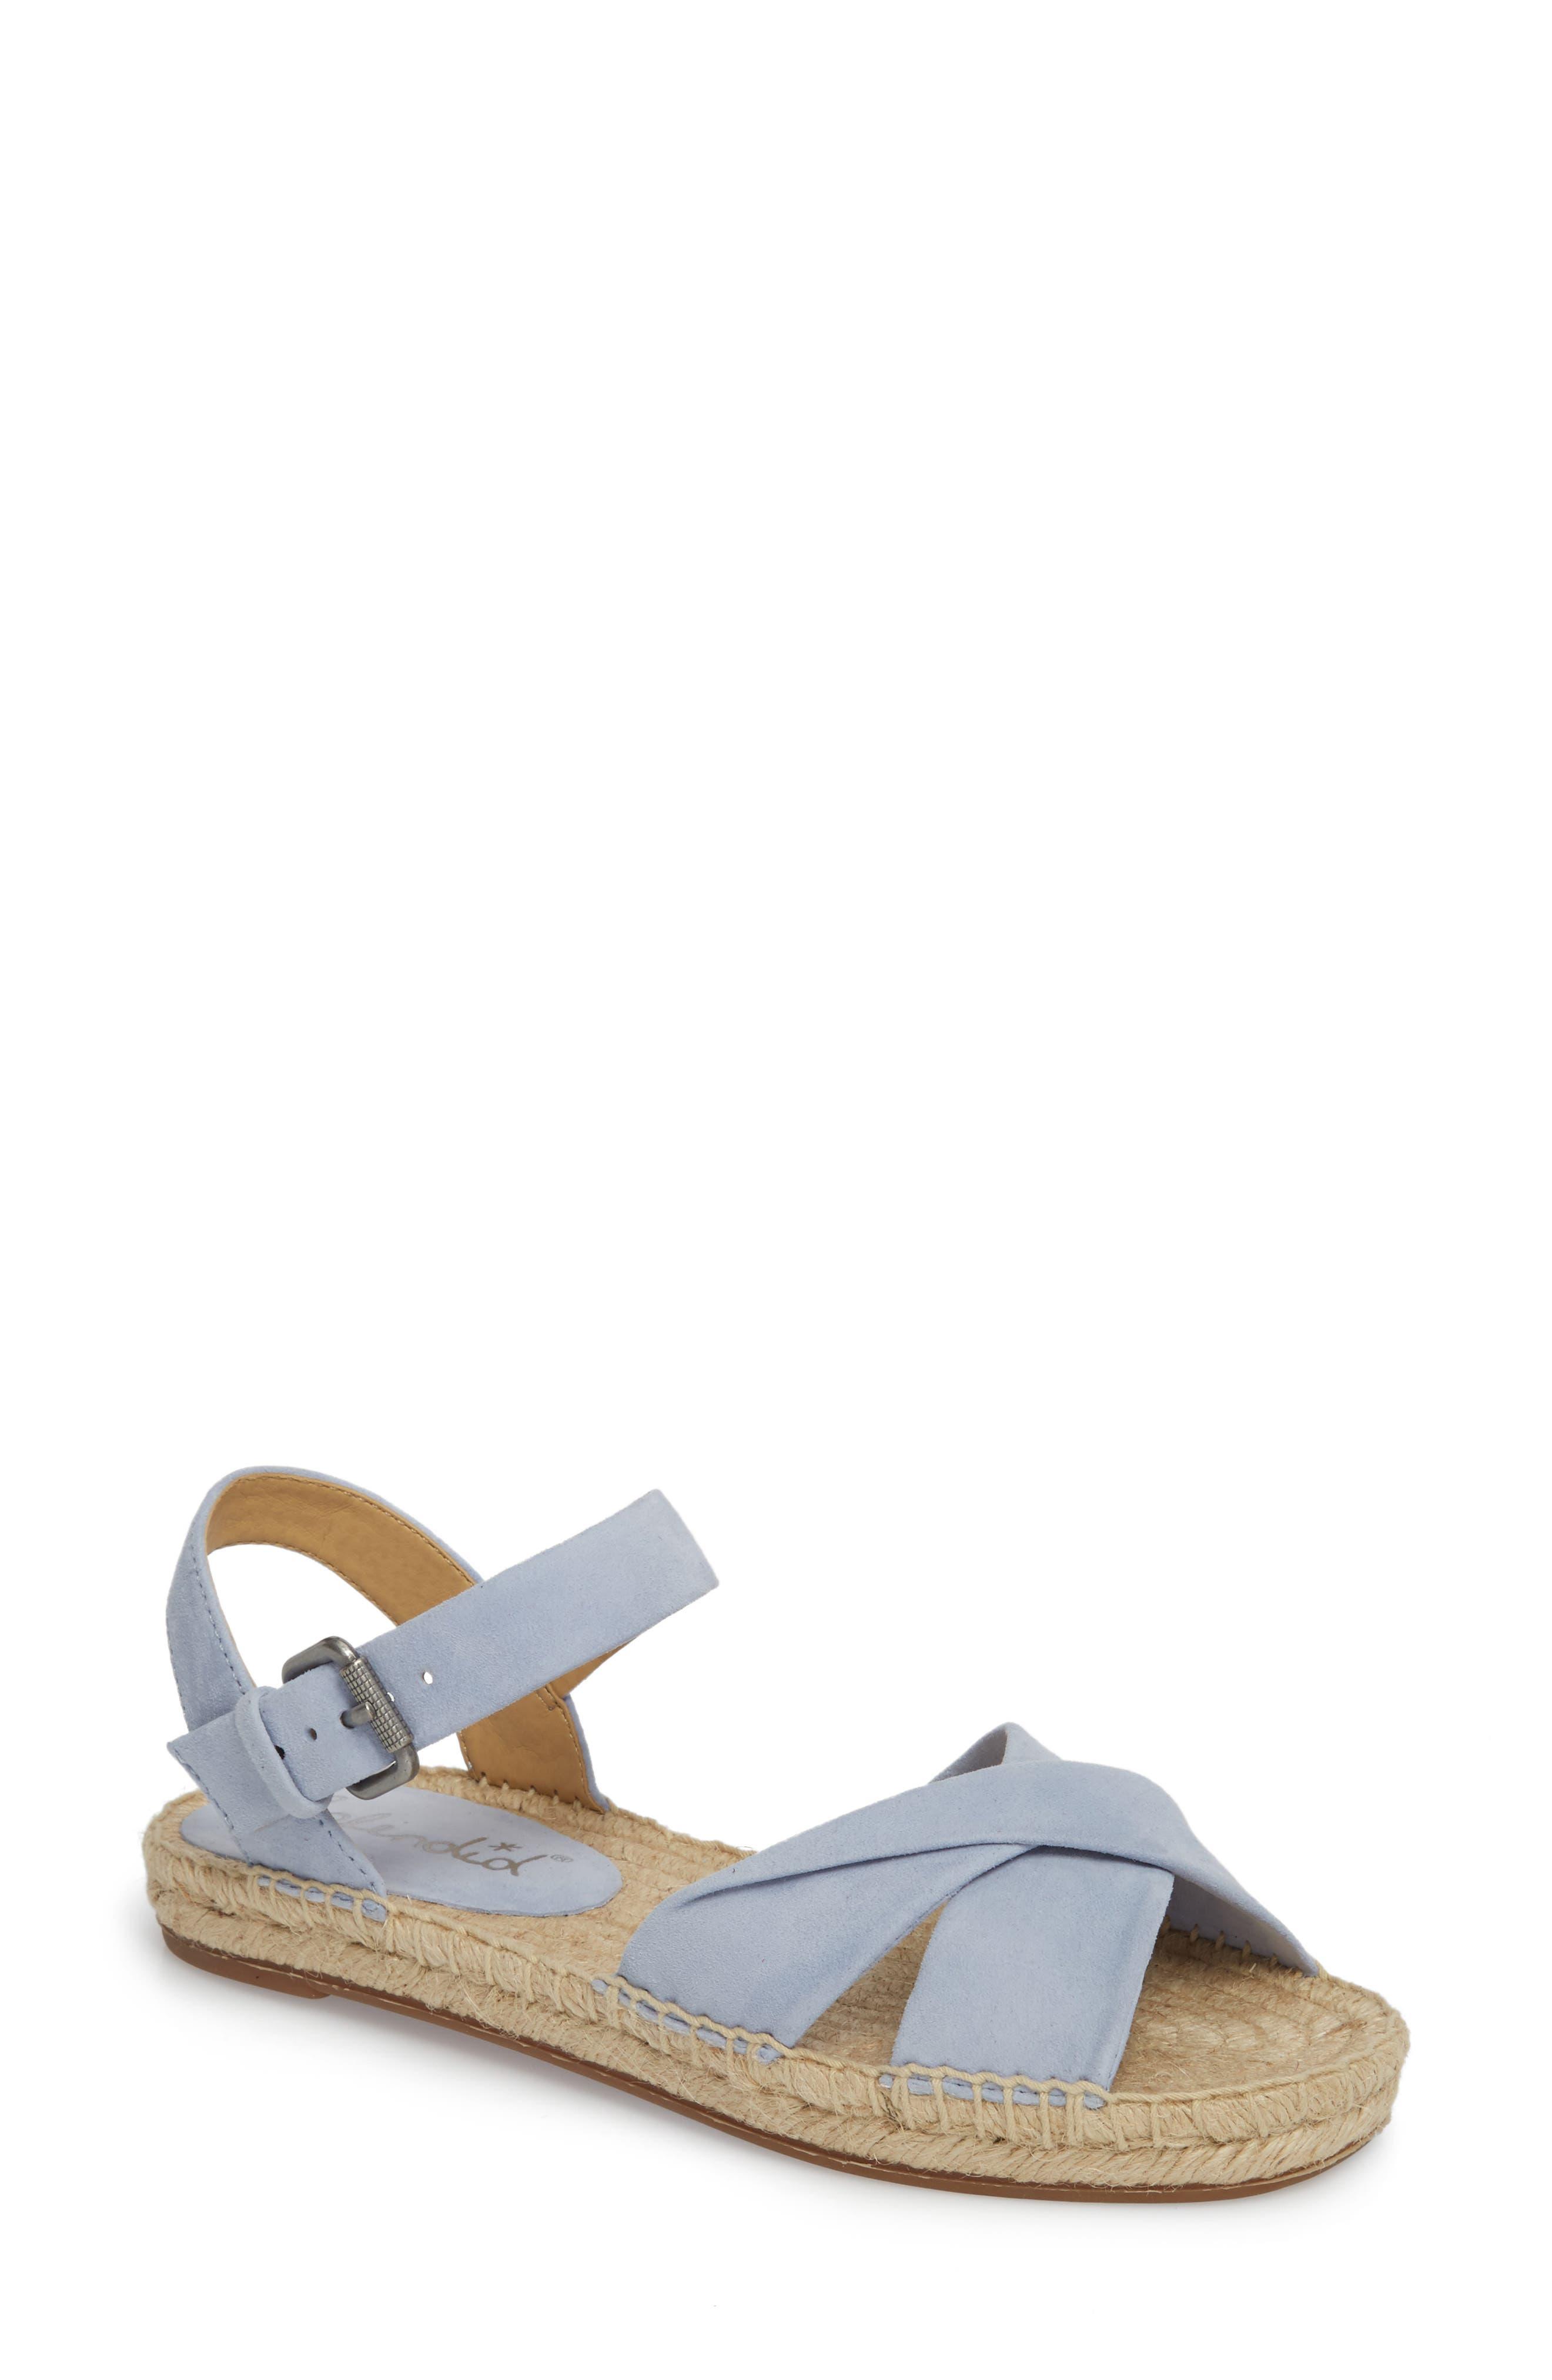 Fae Espadrille Sandal,                         Main,                         color, Lavender Suede